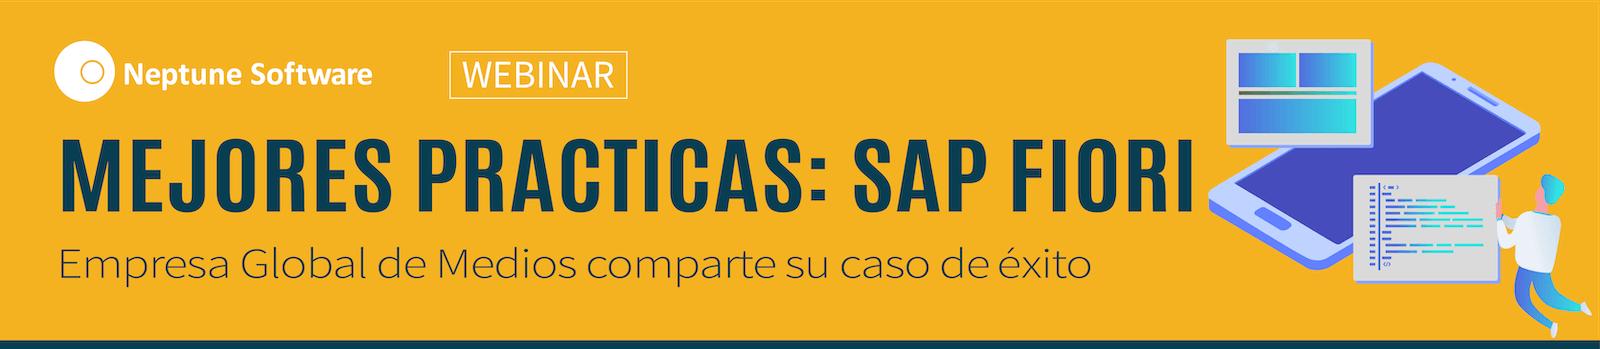 Discovery Webinar Spanish